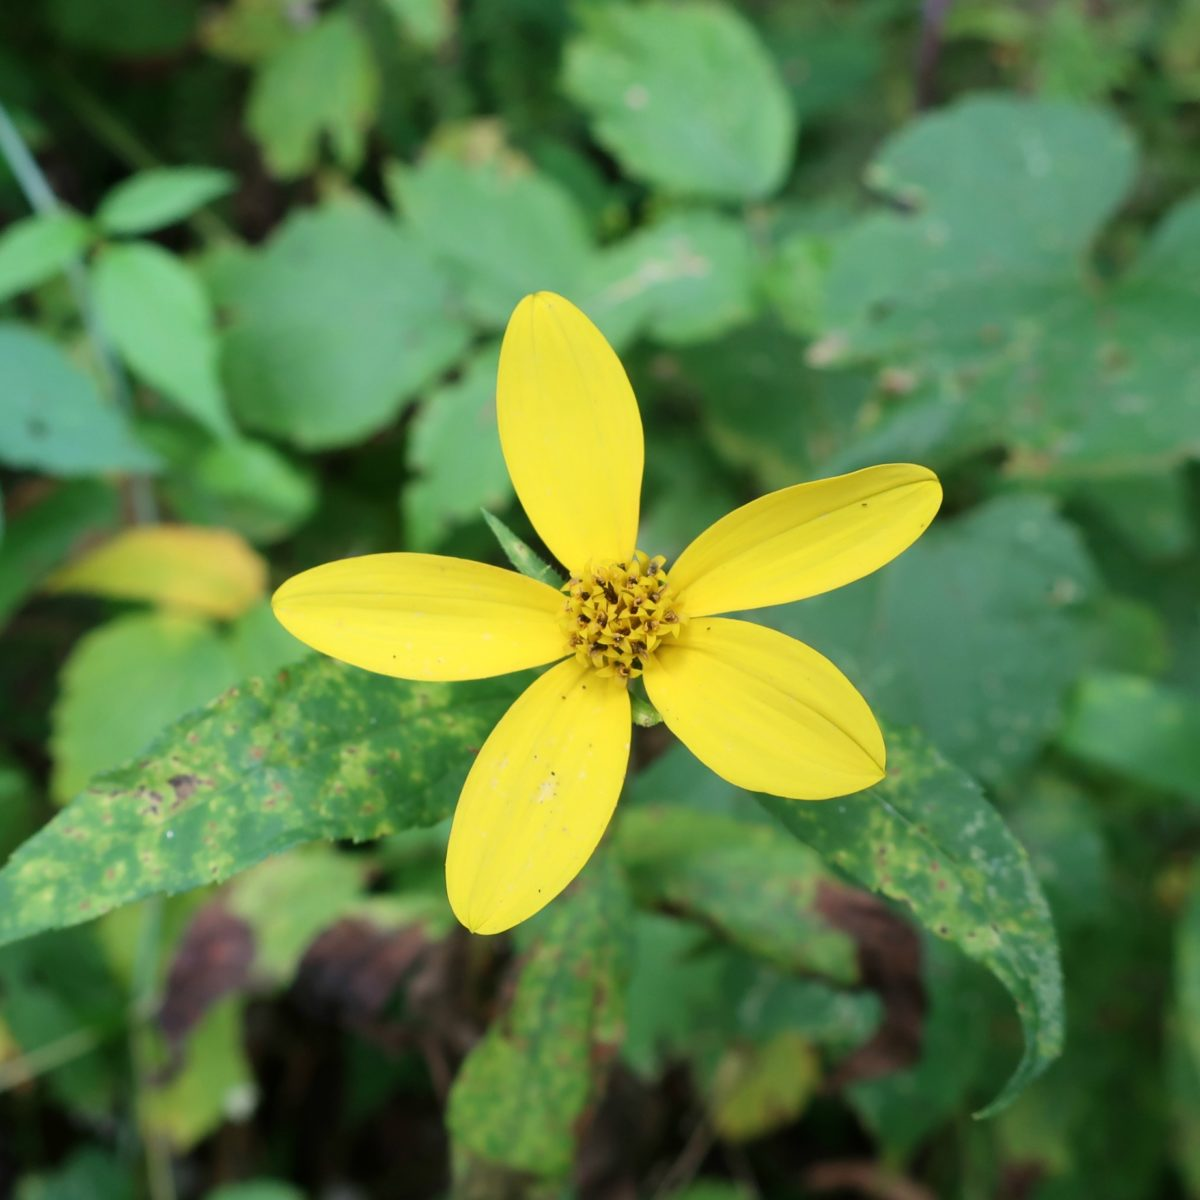 Indian Kill Nature Preserve, Schenectady New York